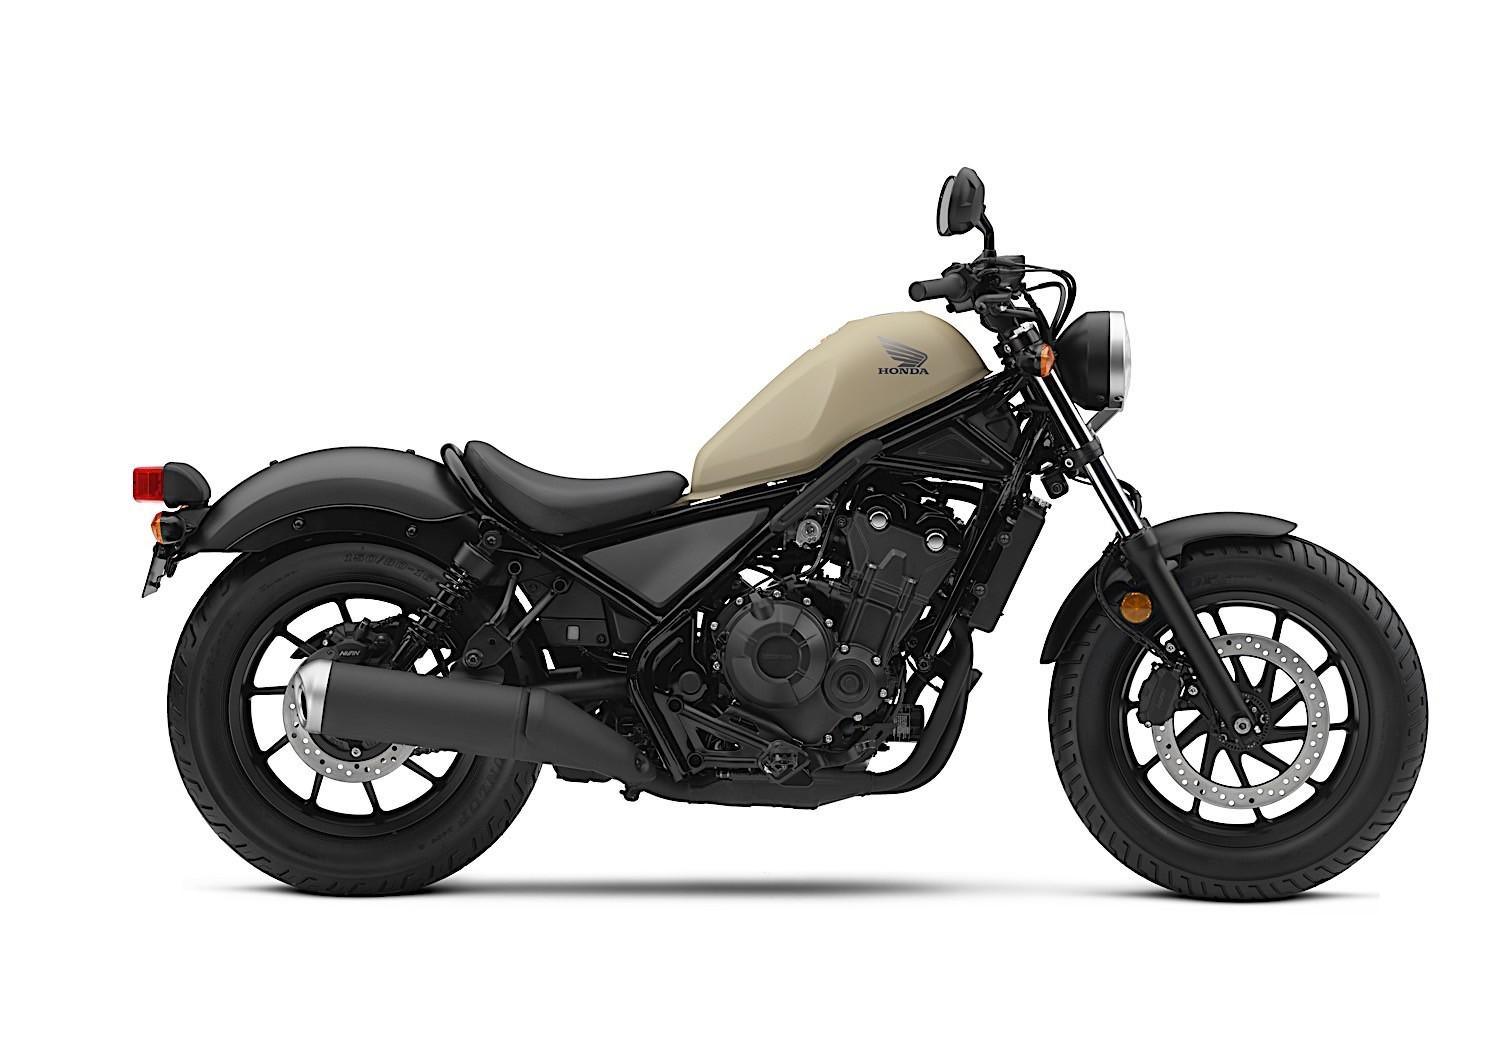 honda motorcycles street rebel announced pricing cmx500 cmx300 models lineup autoevolution motorblog